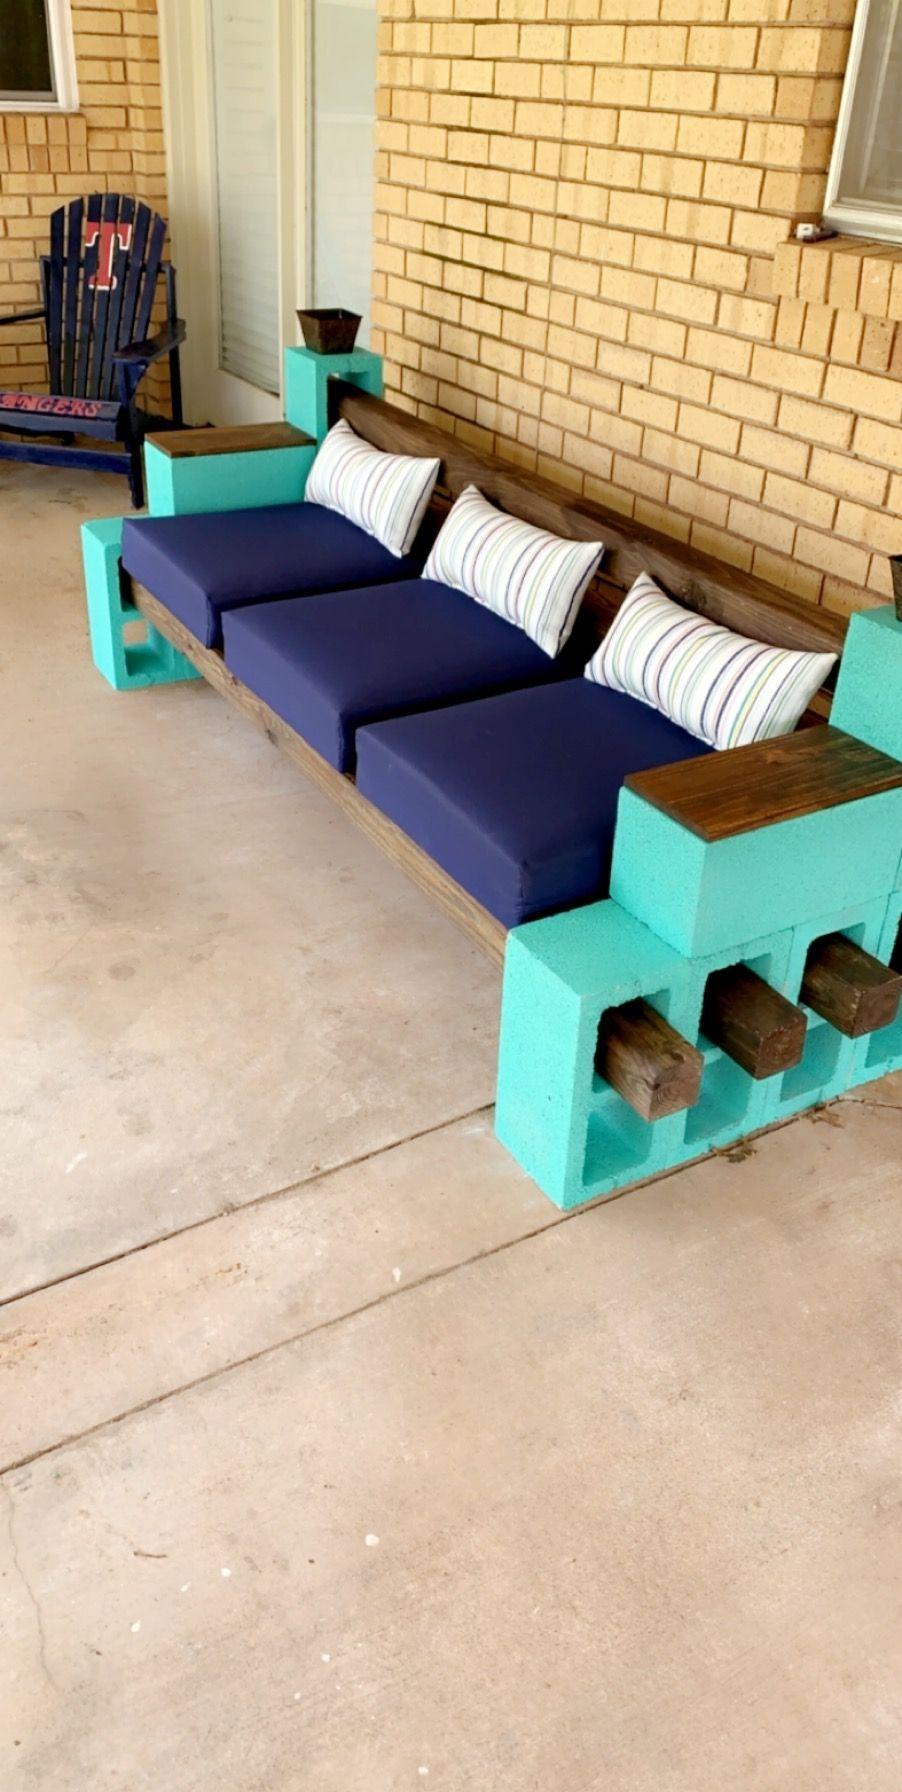 Banc Cinder Block In 2020 Diy Patio Furniture Cheap Cinder Block Furniture Diy Patio Furniture